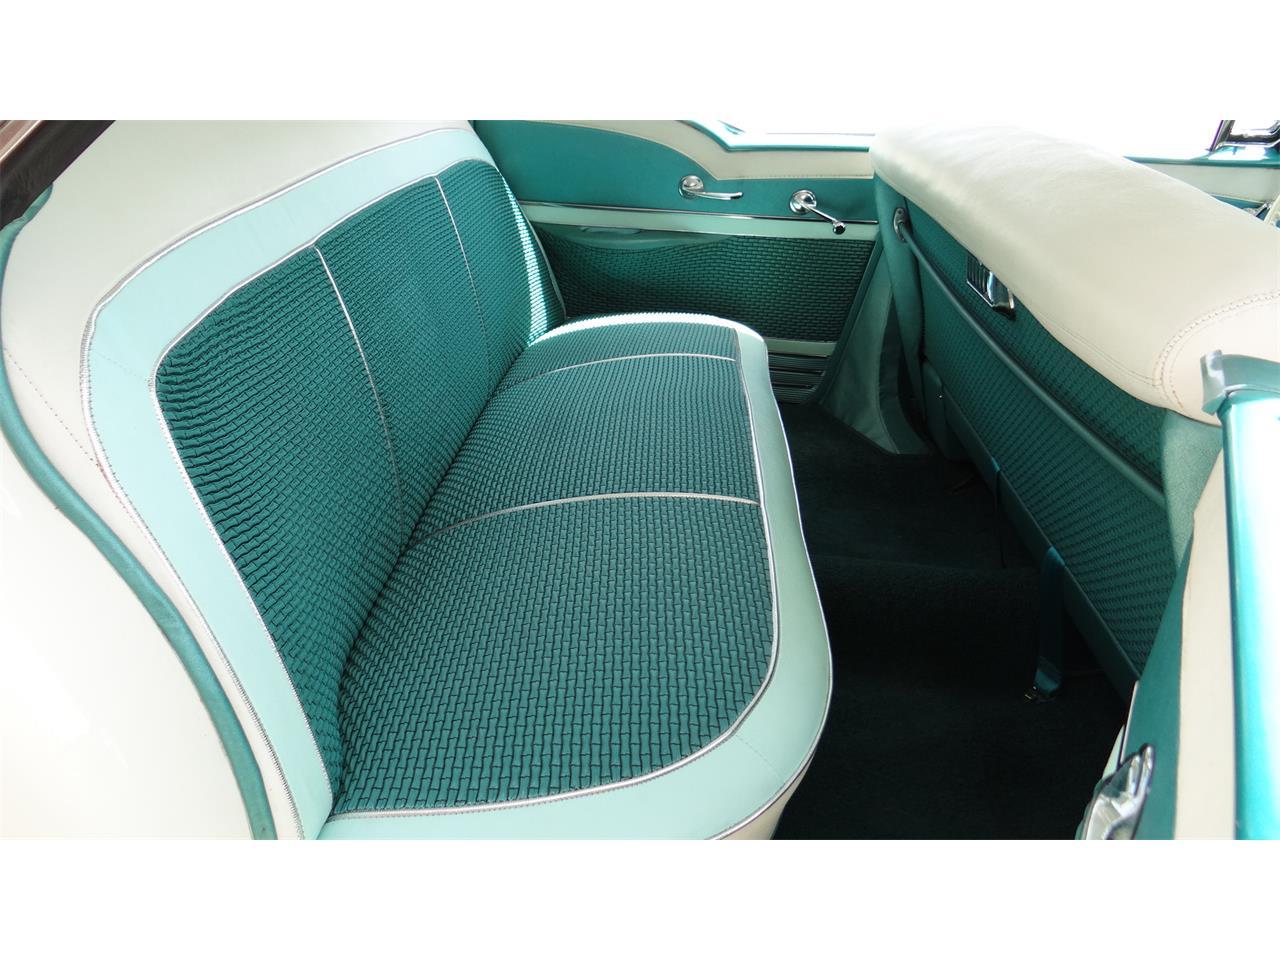 Large Picture of Classic 1957 Oldsmobile Super 88 Offered by Klemme Klassic Kars - Q5GJ